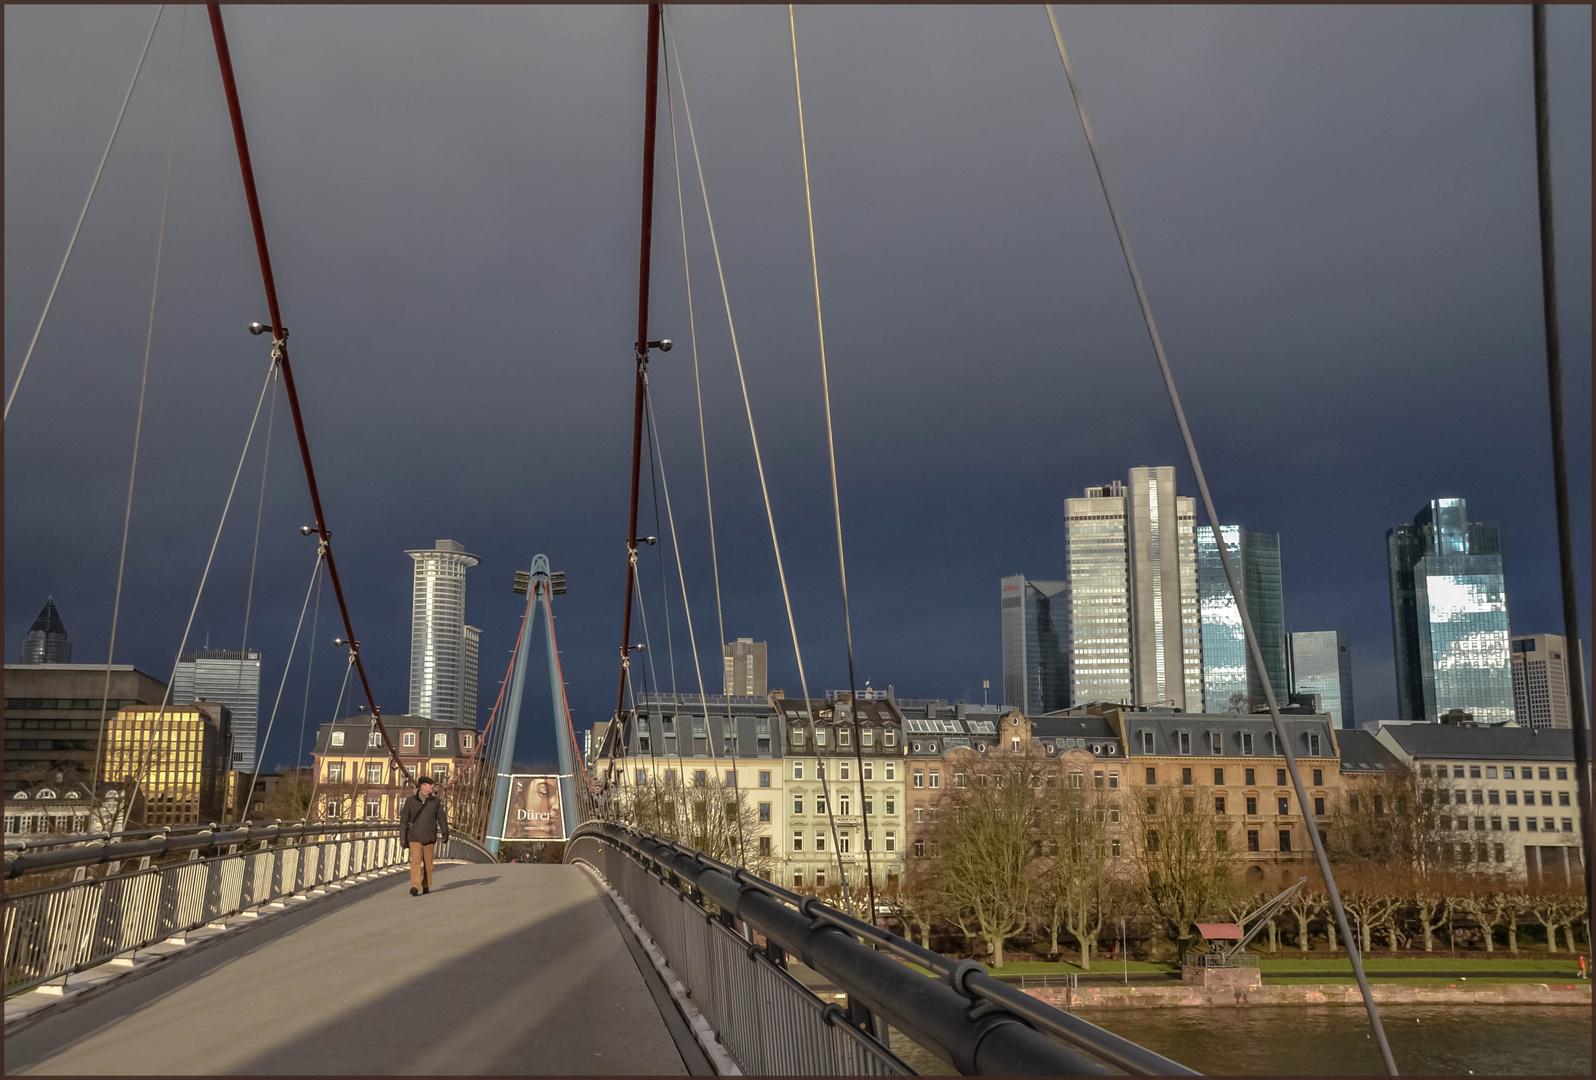 Über die Brücke ...